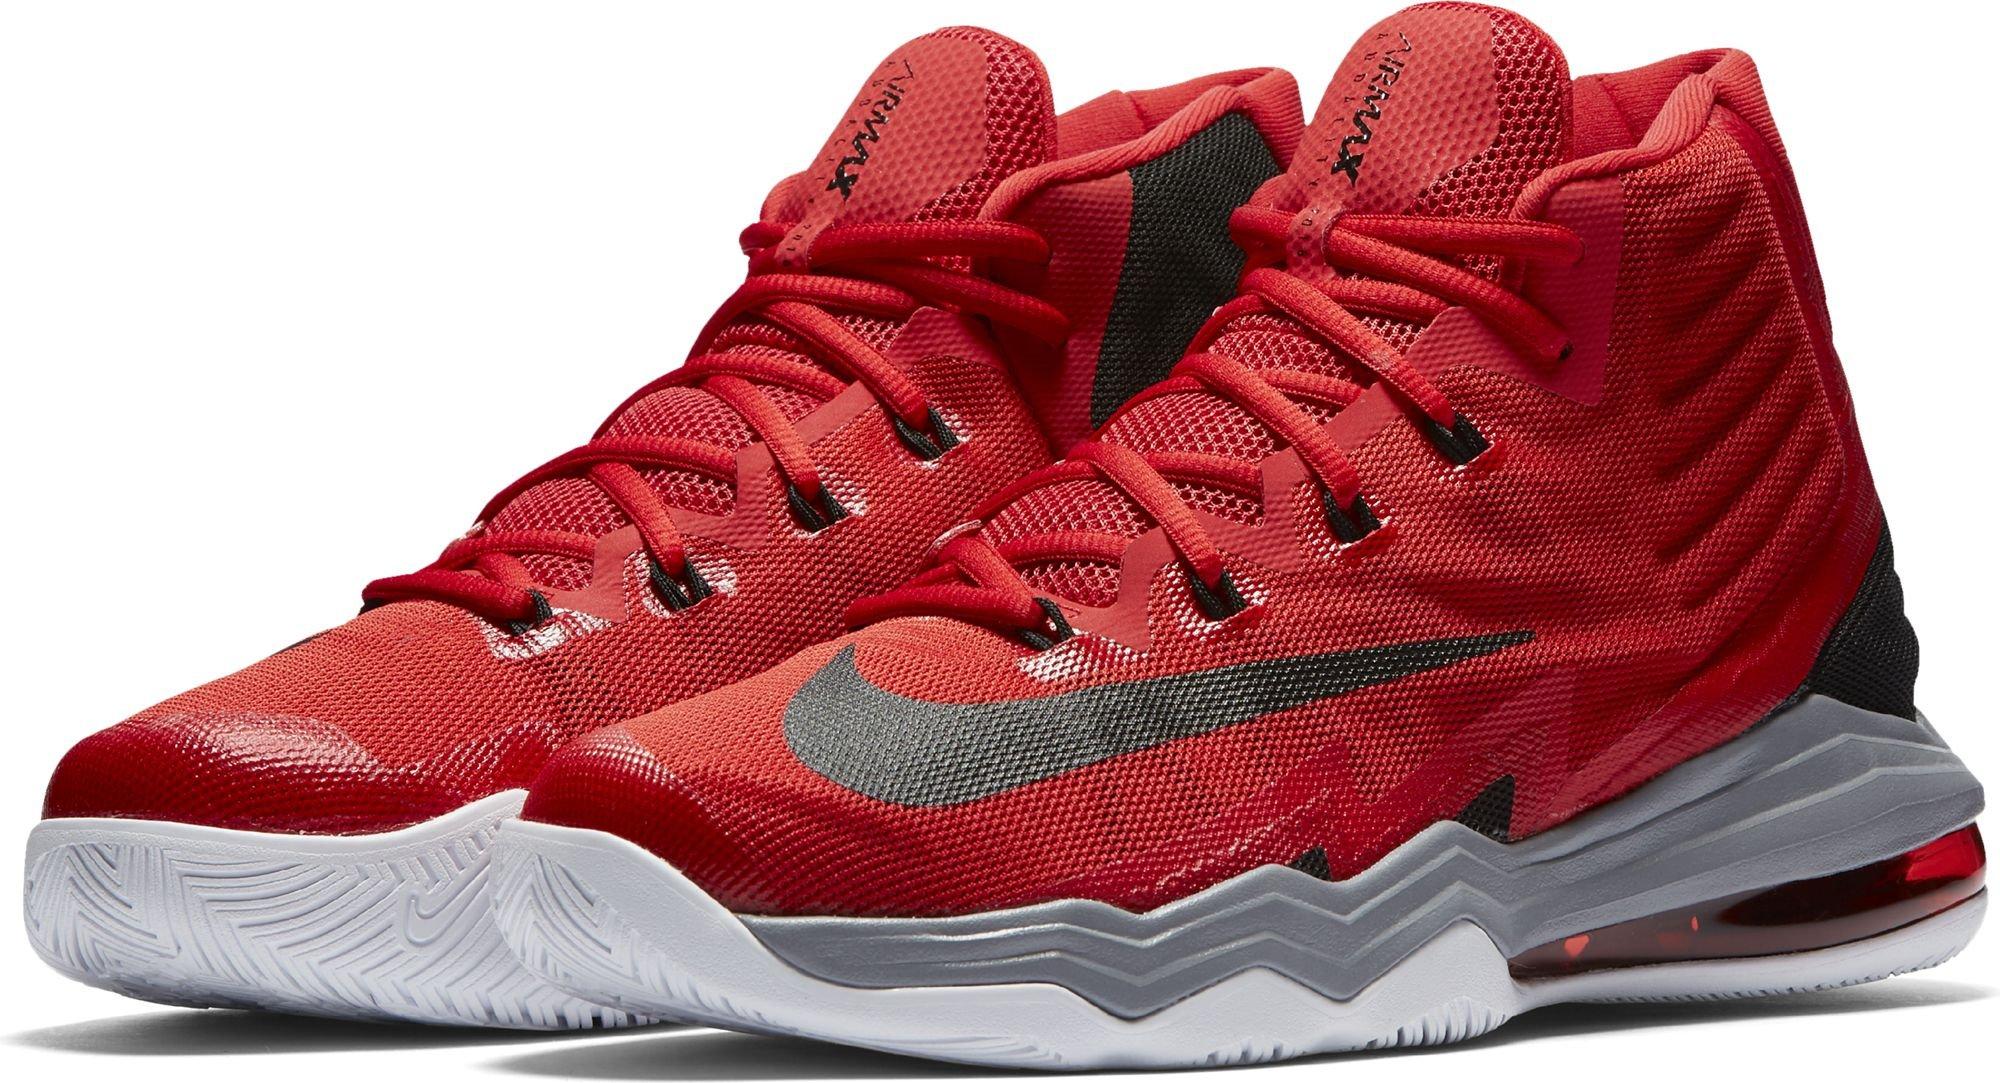 NikeAir Max Audacity 2016 - Scarpe da Basket Uomo , rosso (University Red/Weiß/Stealth/Schwarz), 43